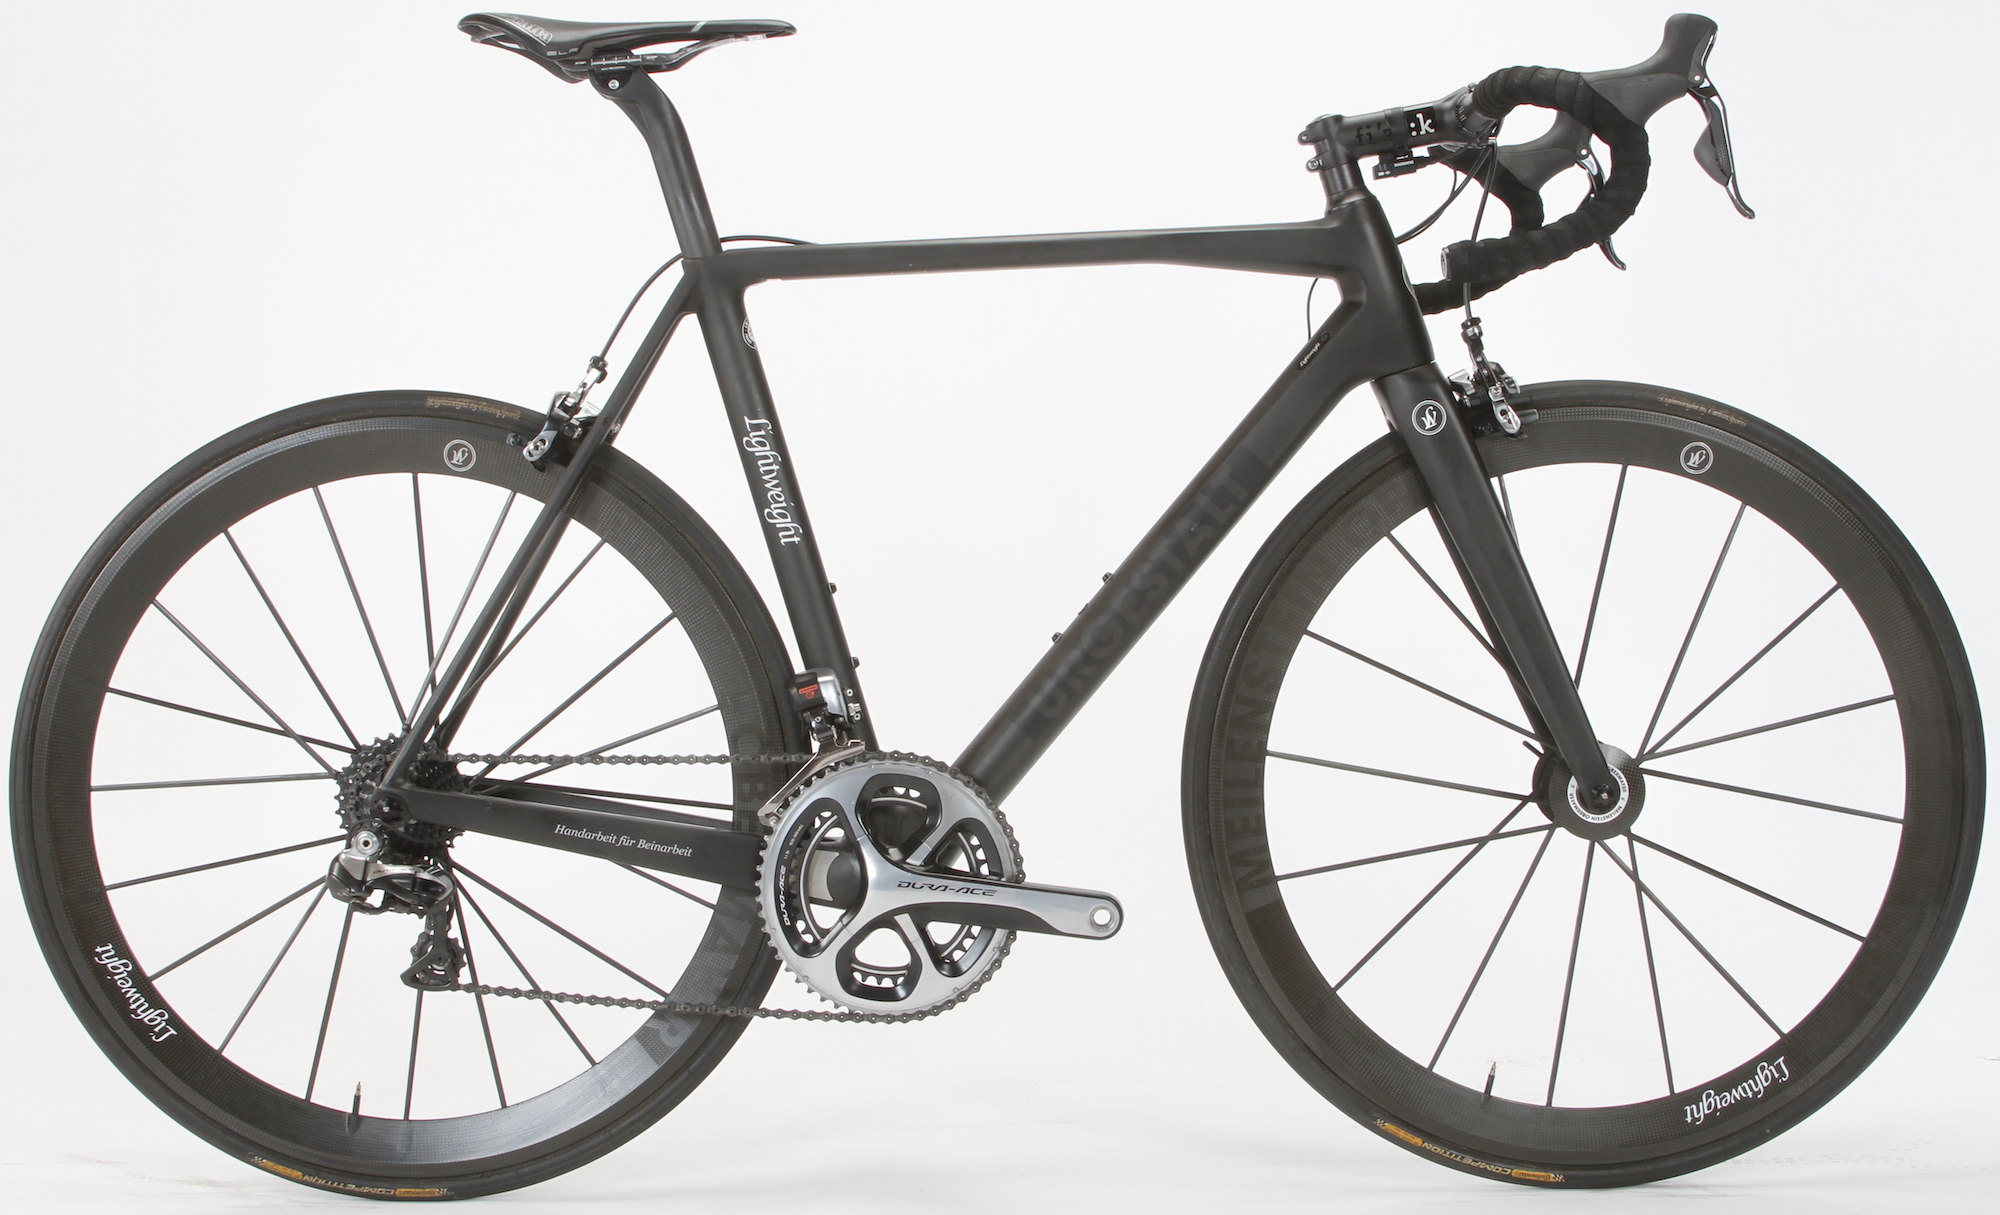 The Lightweight Urgestalt: German Engineered, Carbon Fiber Bike Frame